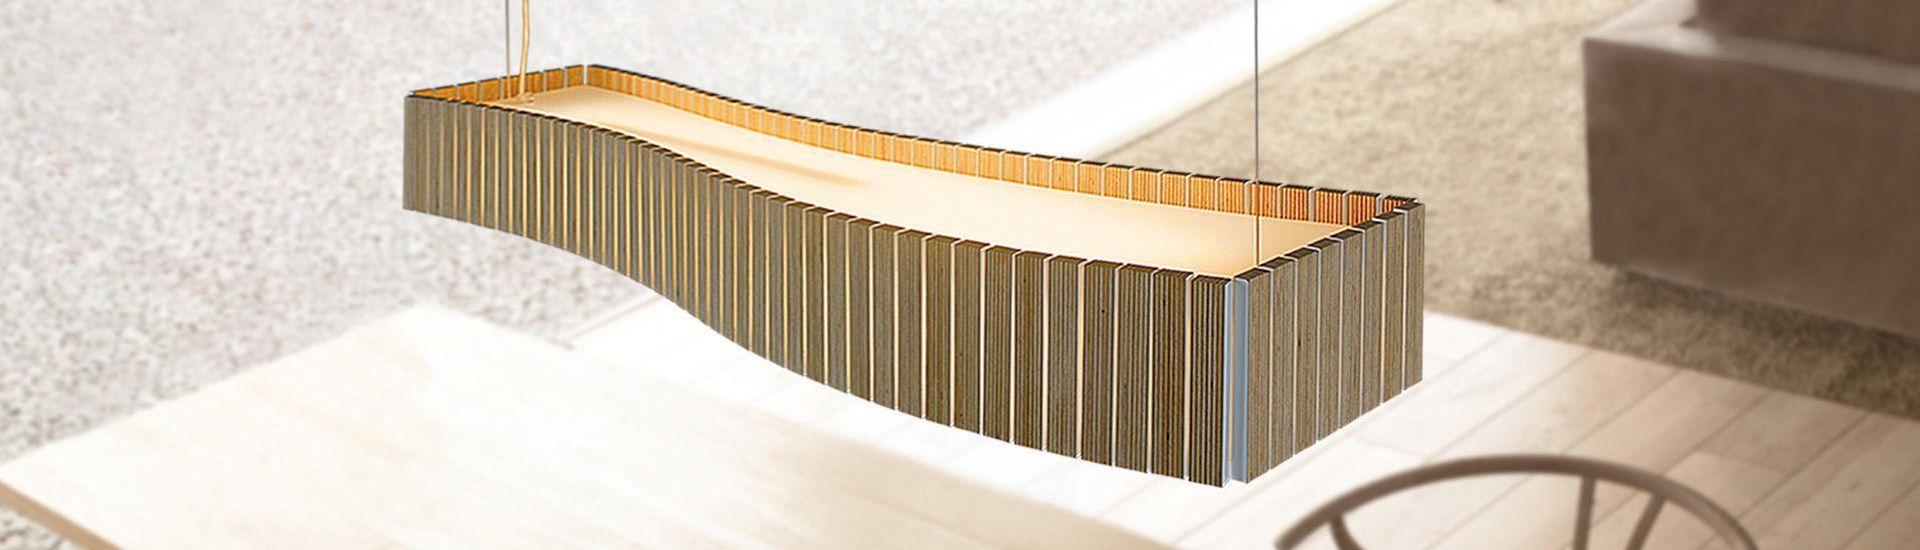 Uxi Pendelleuchte 2x39W tablero marino